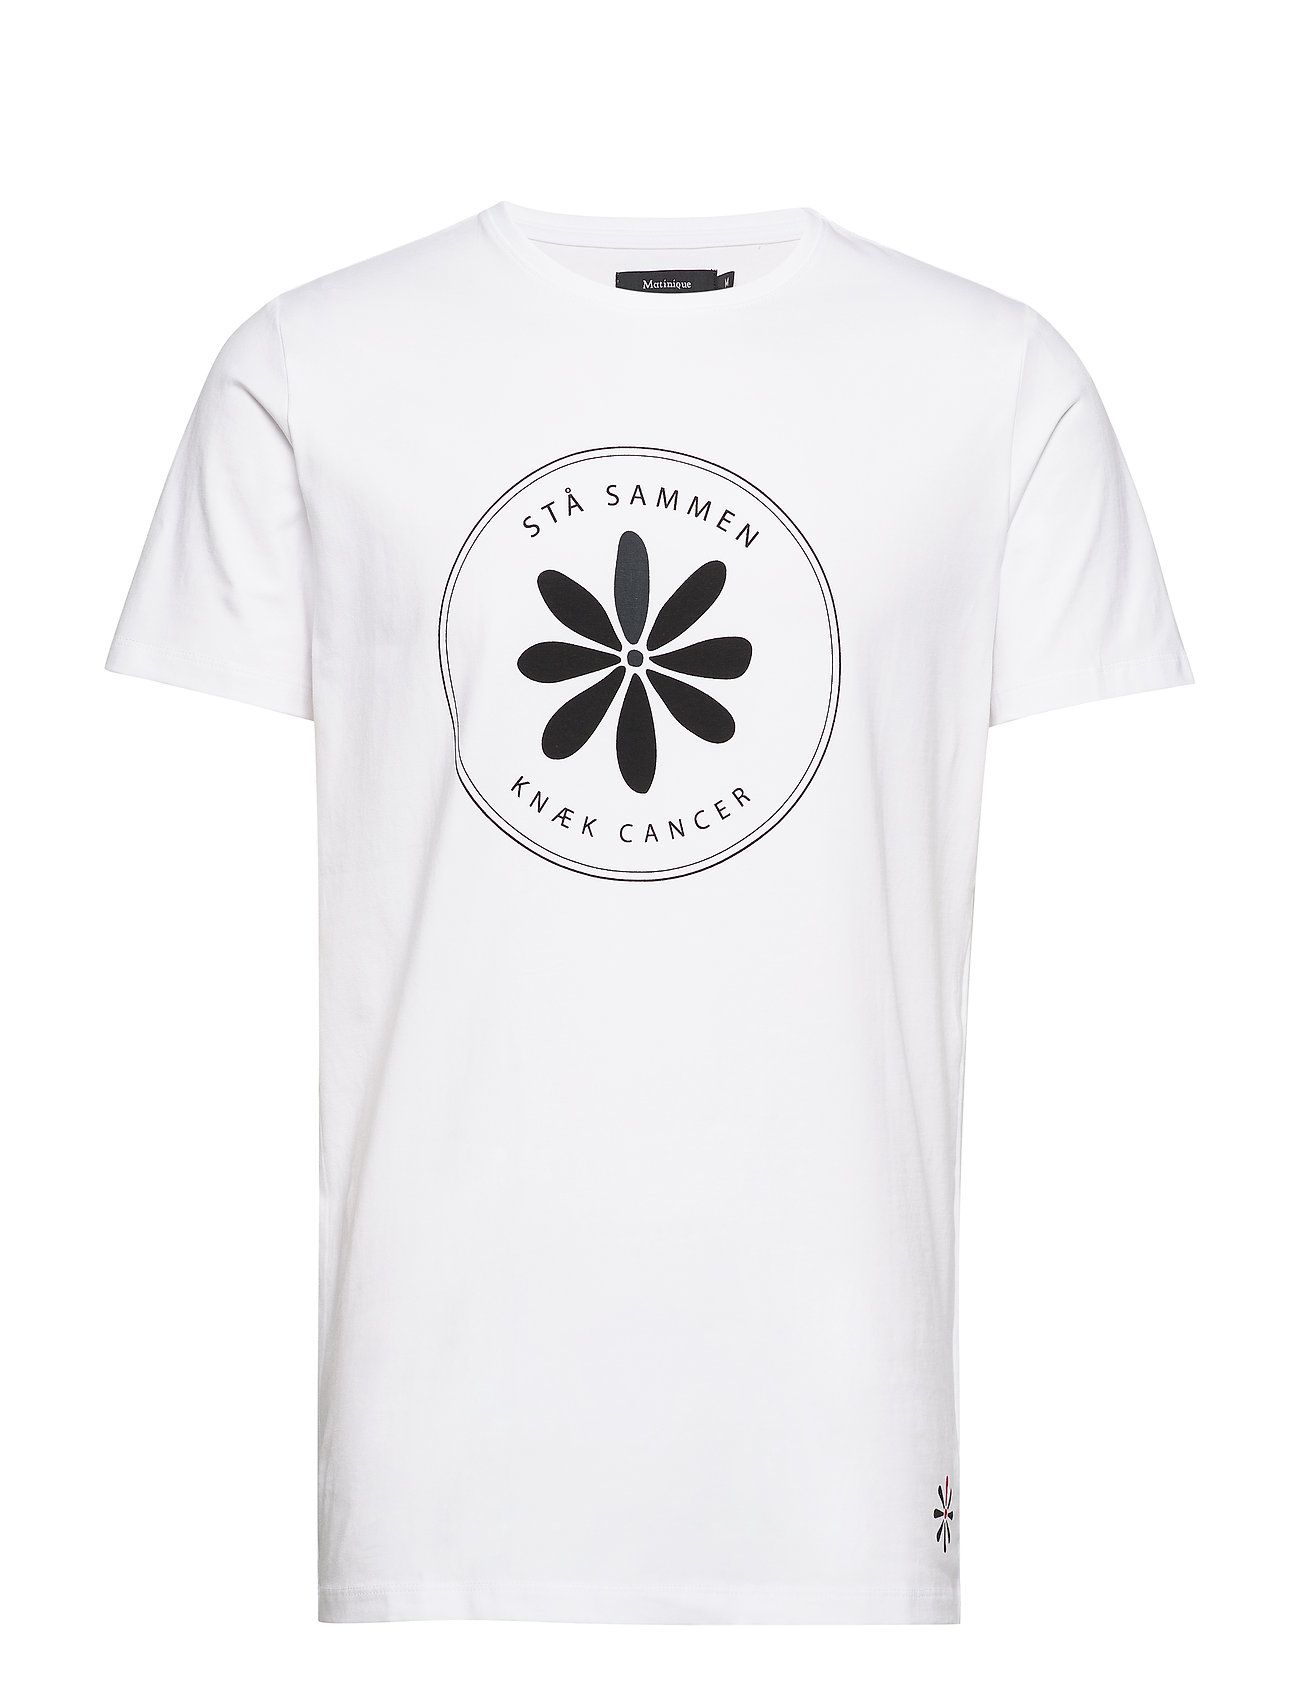 Matinique Knæk Cancer Knæk Cancer t-shirt - WHITE